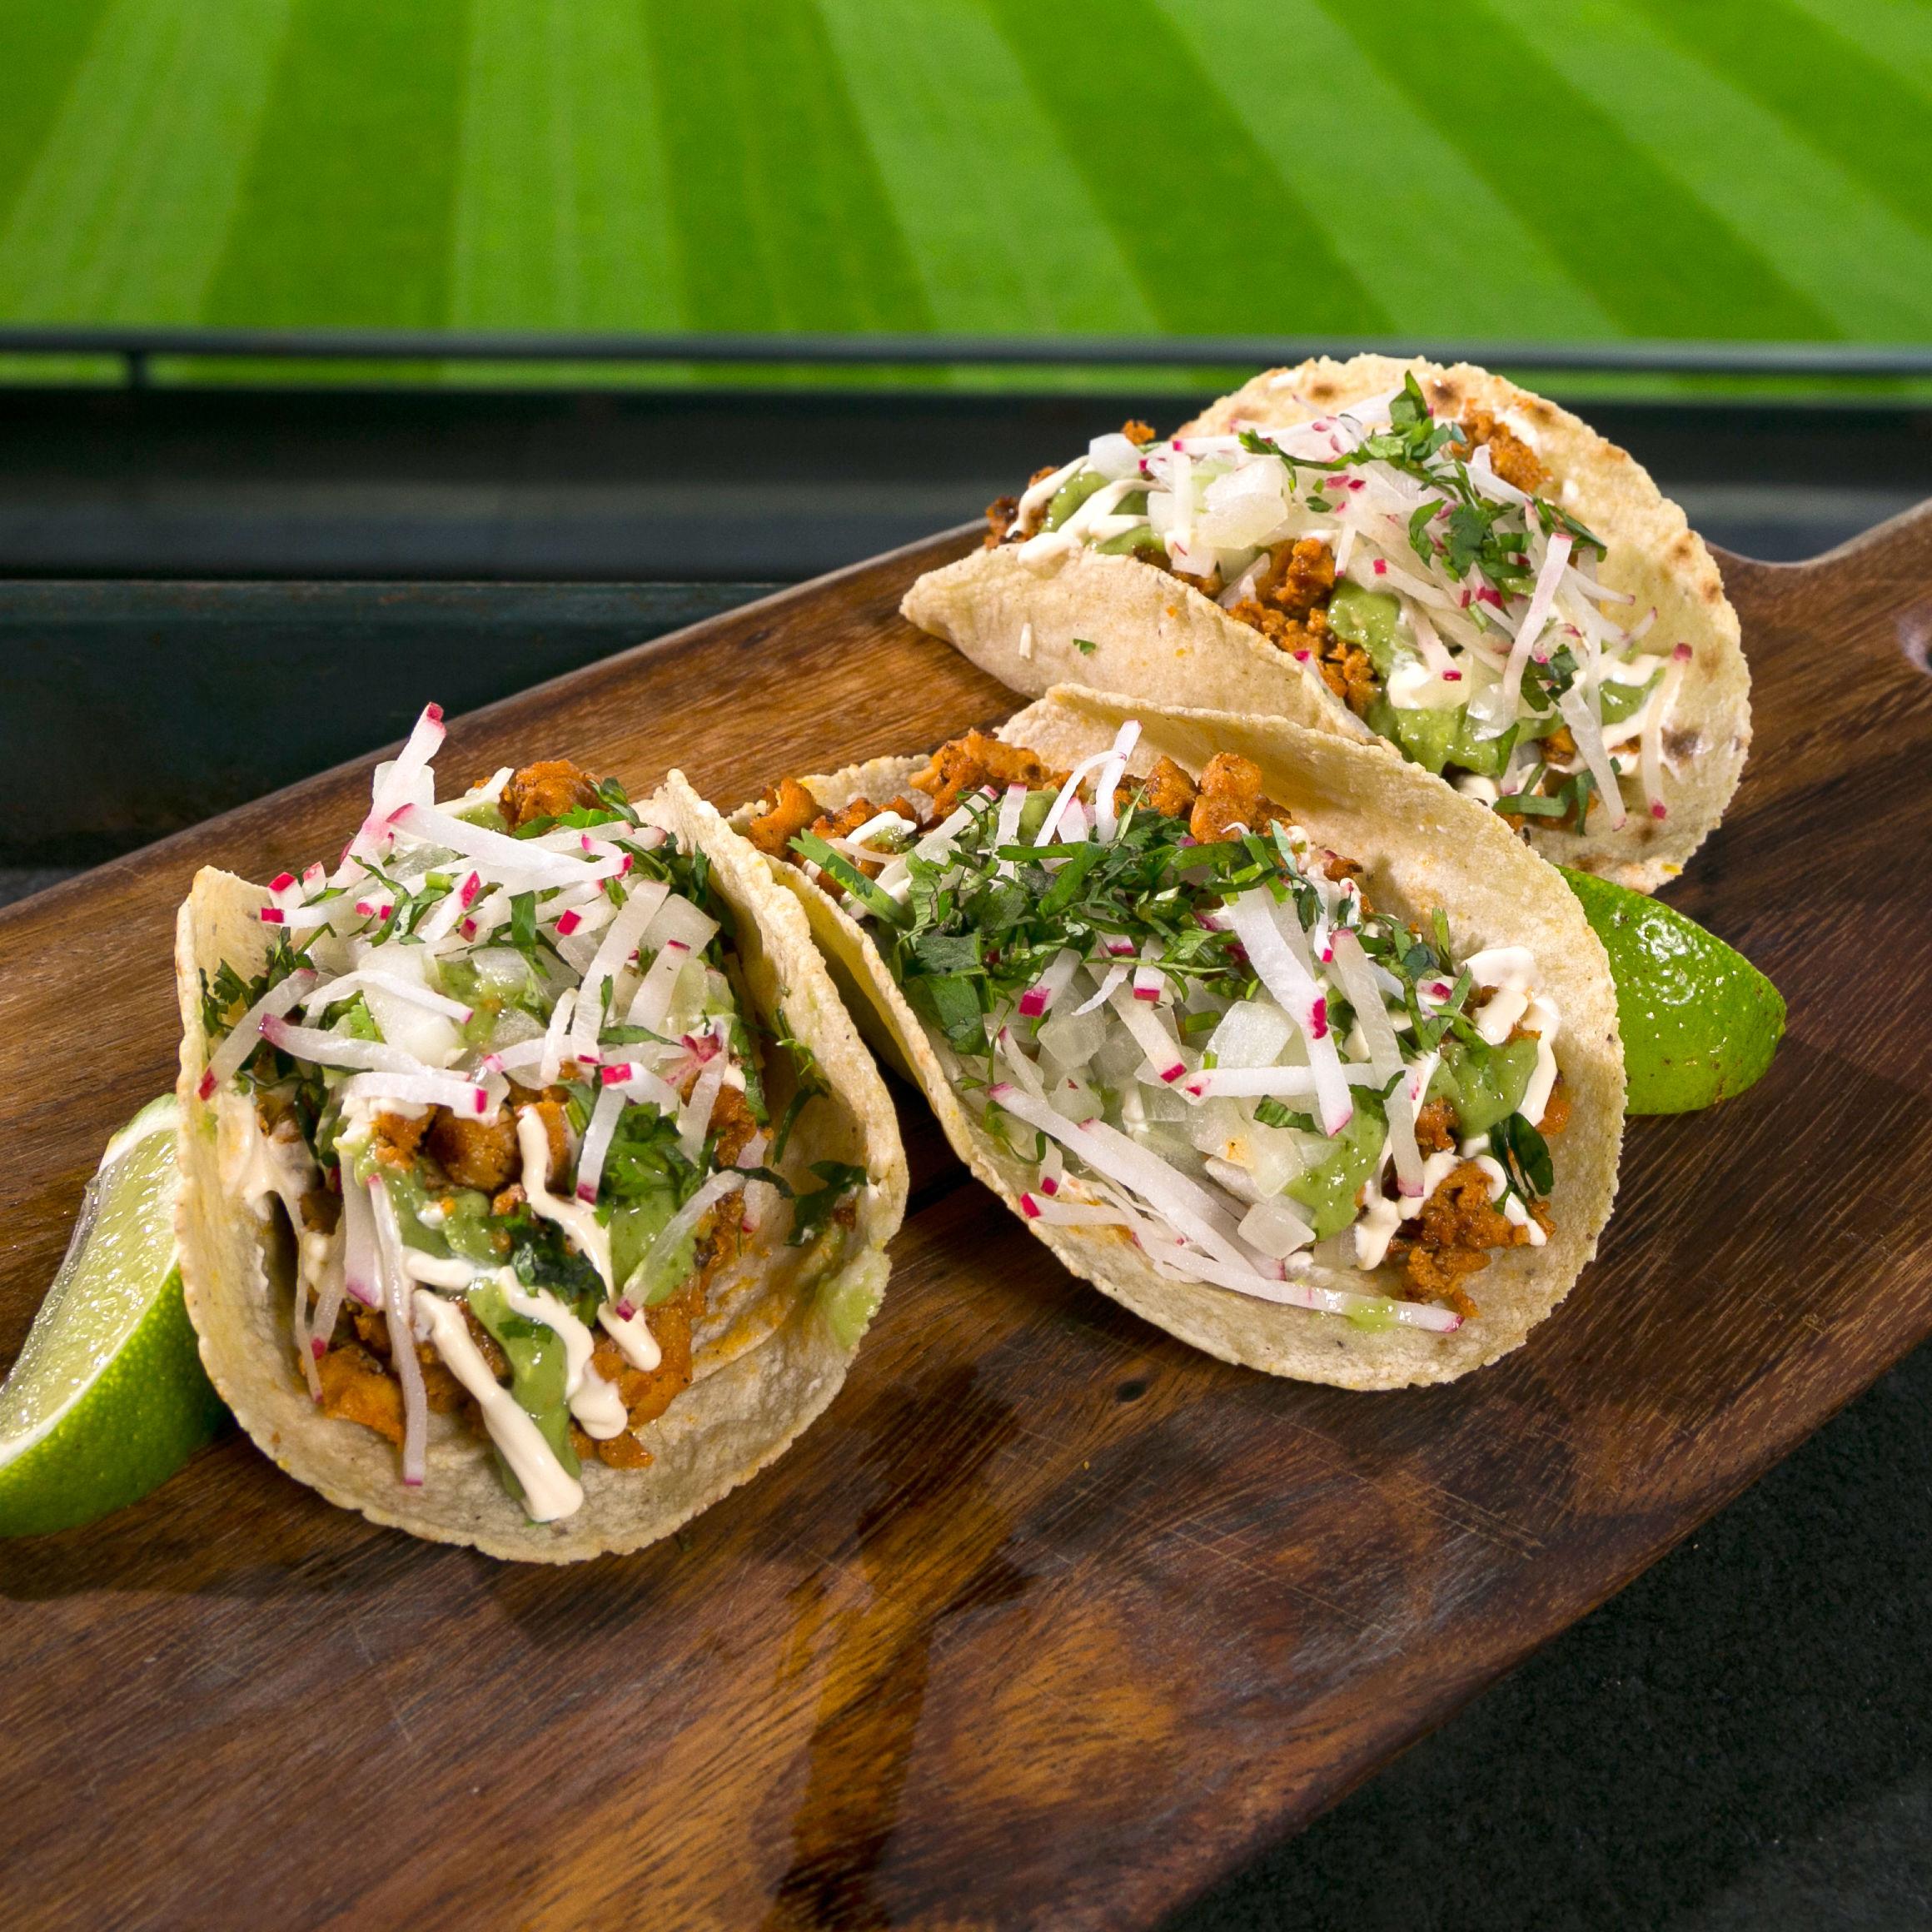 Poquitos tacos 03 oqvga3 kuxzne